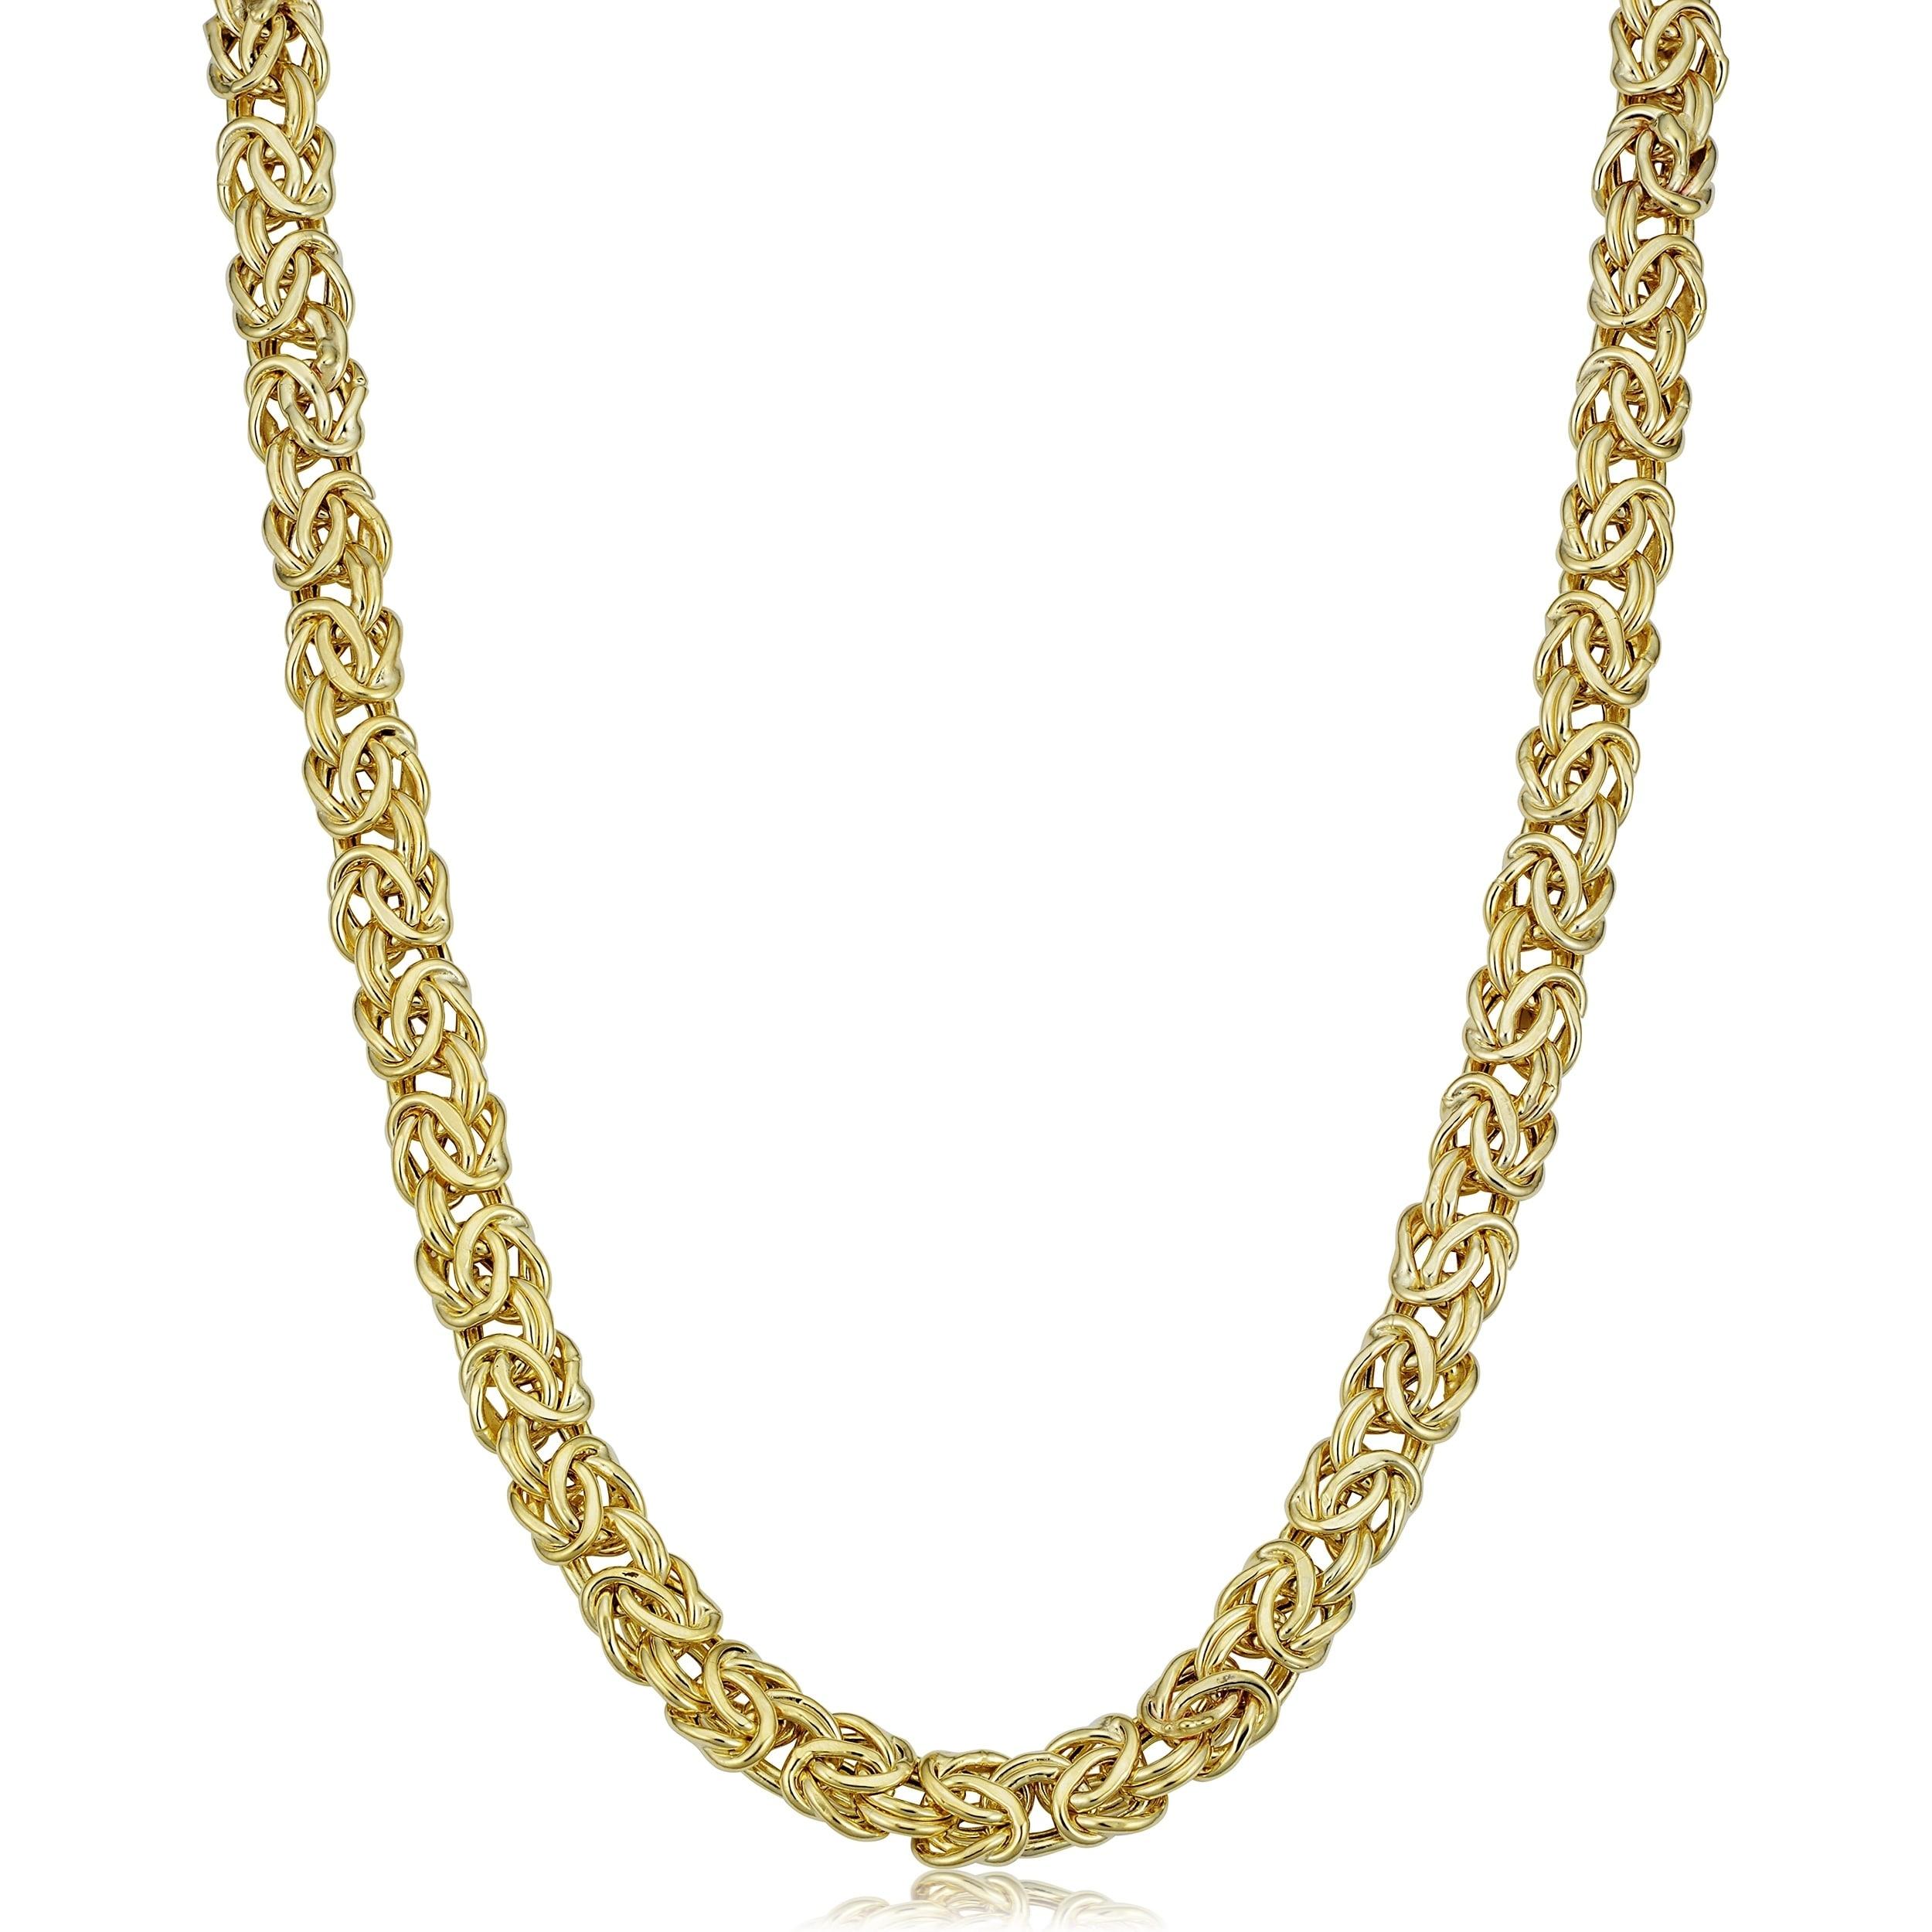 Fremada 14k Yellow Gold 6-mm Byzantine Necklace (18 inche...